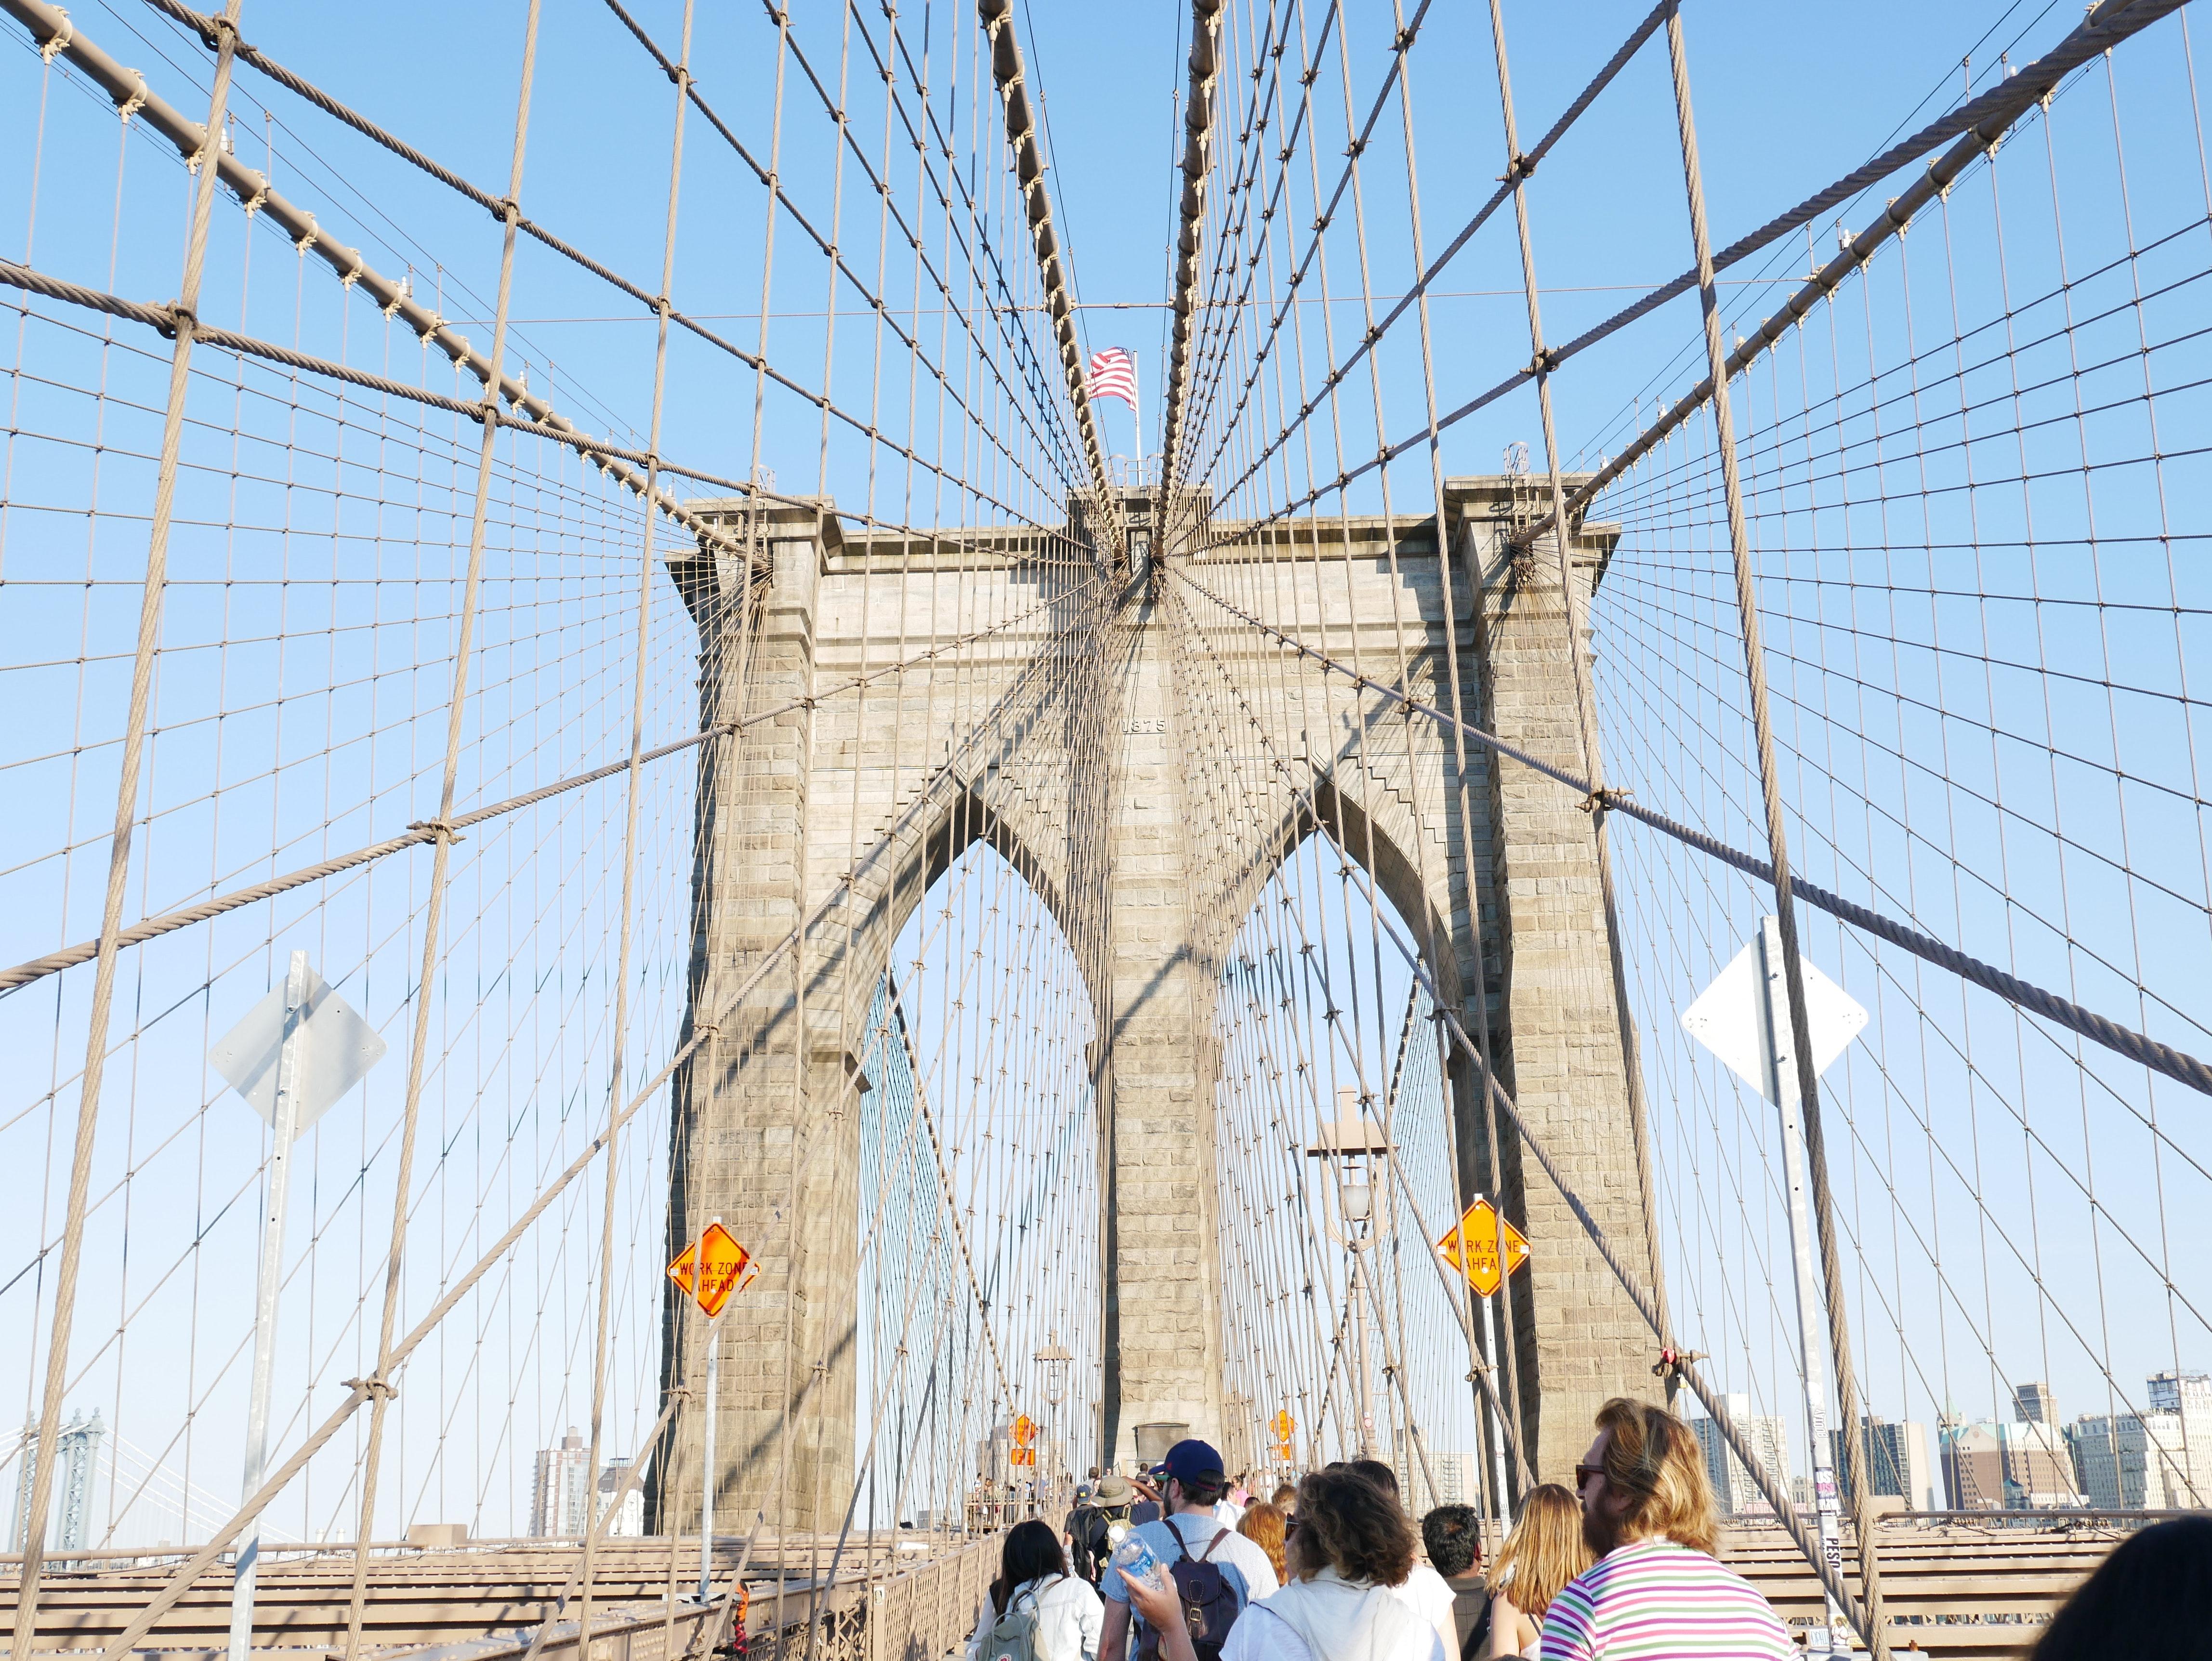 Brooklyn Bridge, U.s.a., American flag, Landmark, Tower, Steel, HQ Photo